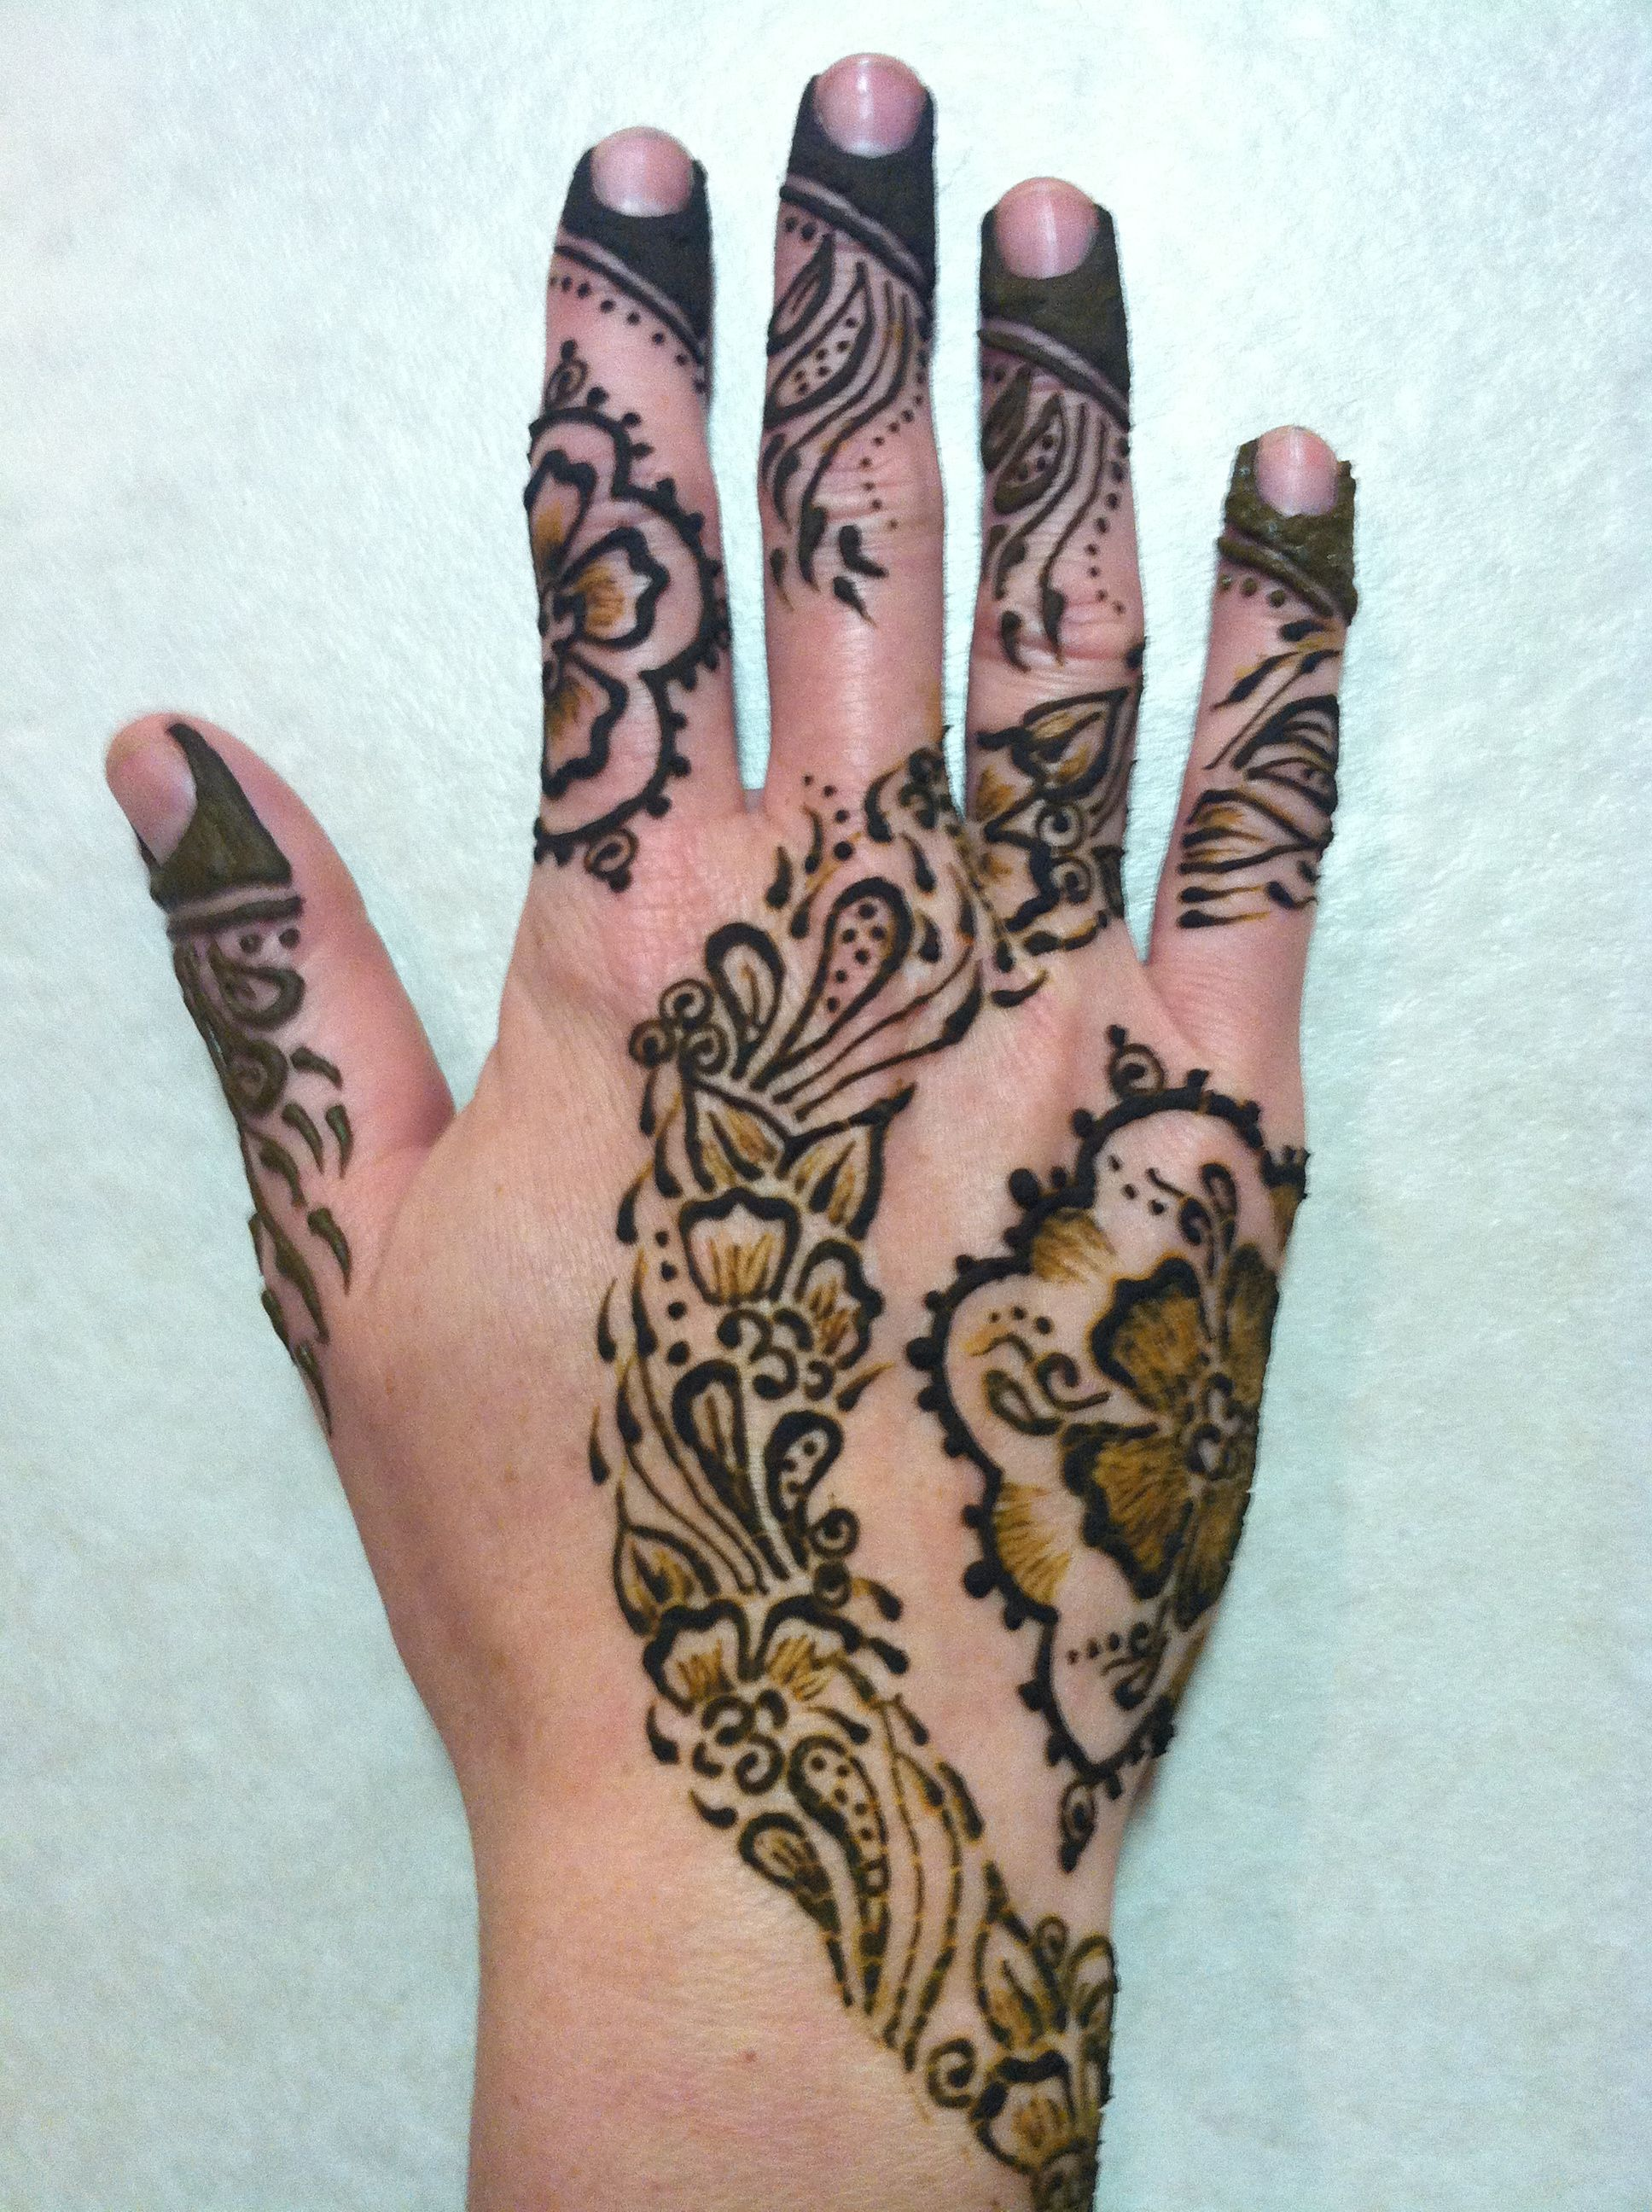 Khaleeji Henna Designs Tattoo: Khaleeji Style Henna With Inspiration From Darcy Of Henna